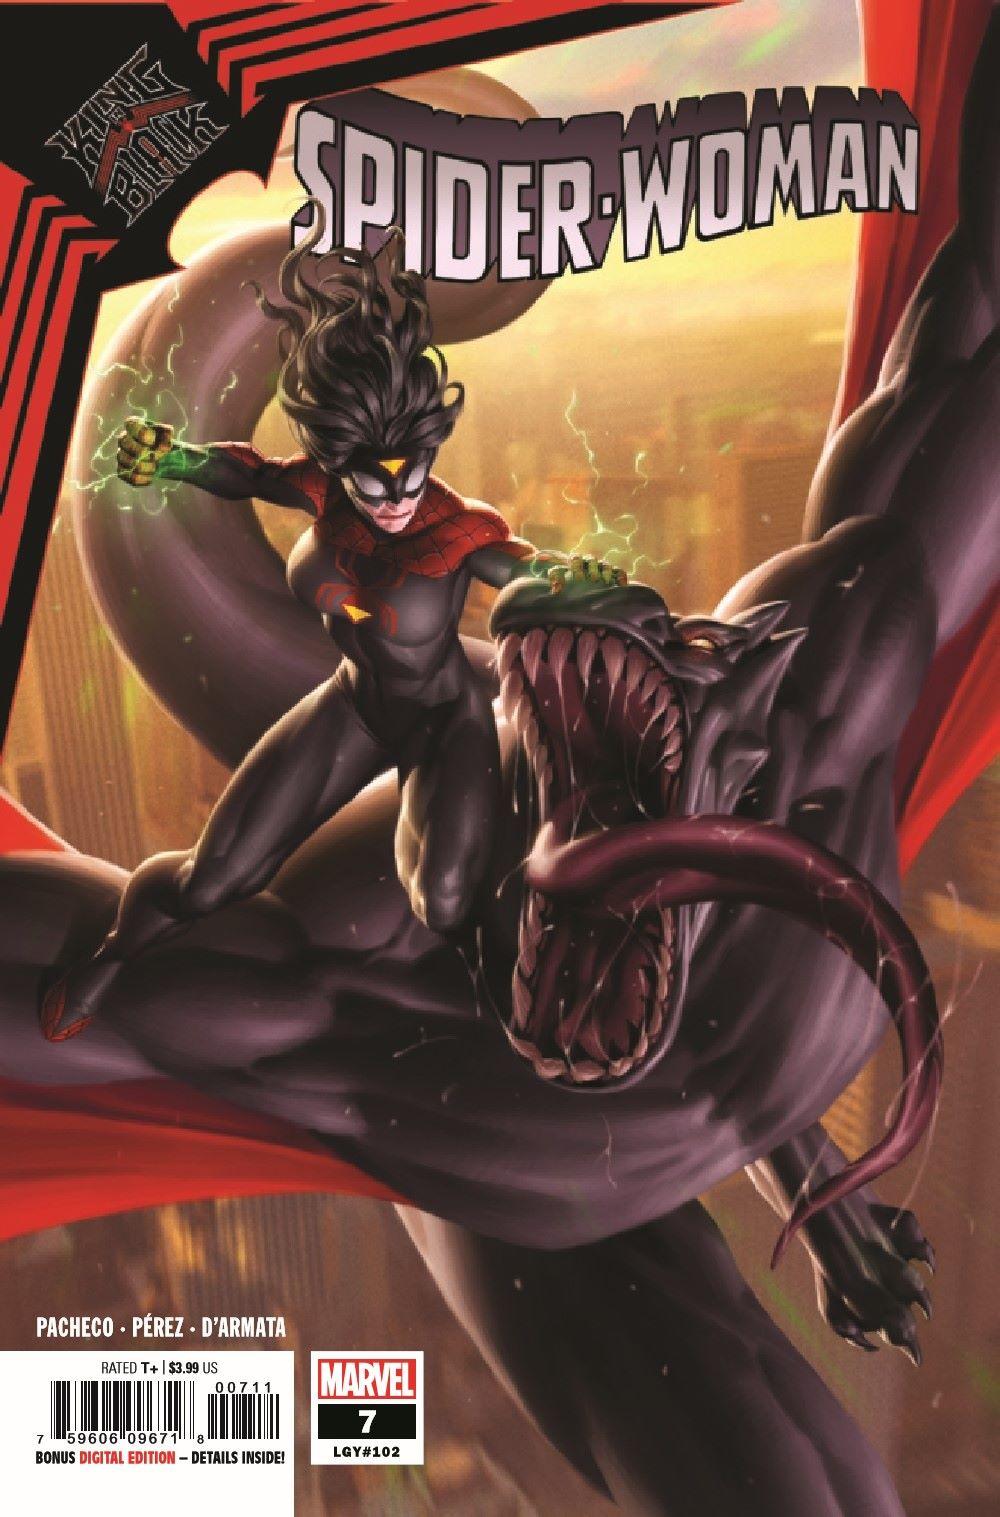 SWOMAN2020007_Preview-1 ComicList Previews: SPIDER-WOMAN #7